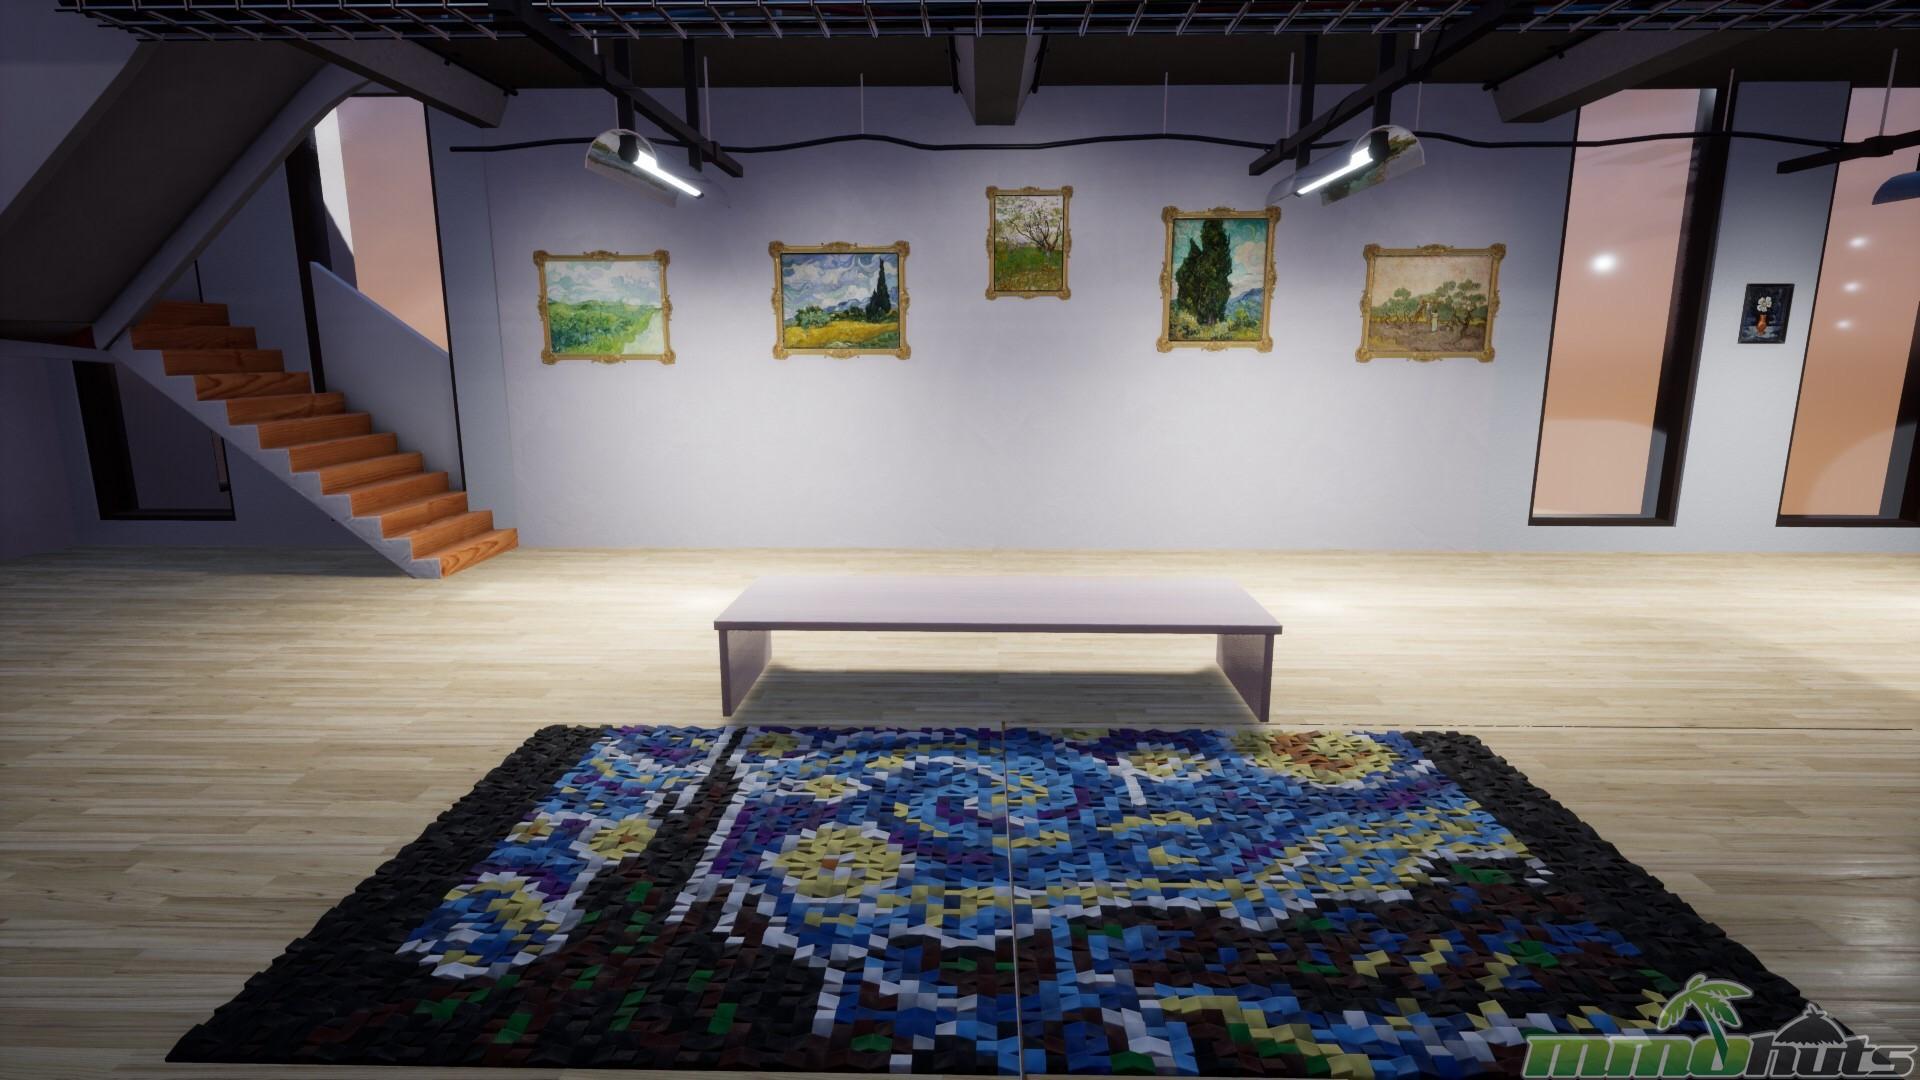 Tile Mosaic recreation of Van Gogh's painting Starry Night